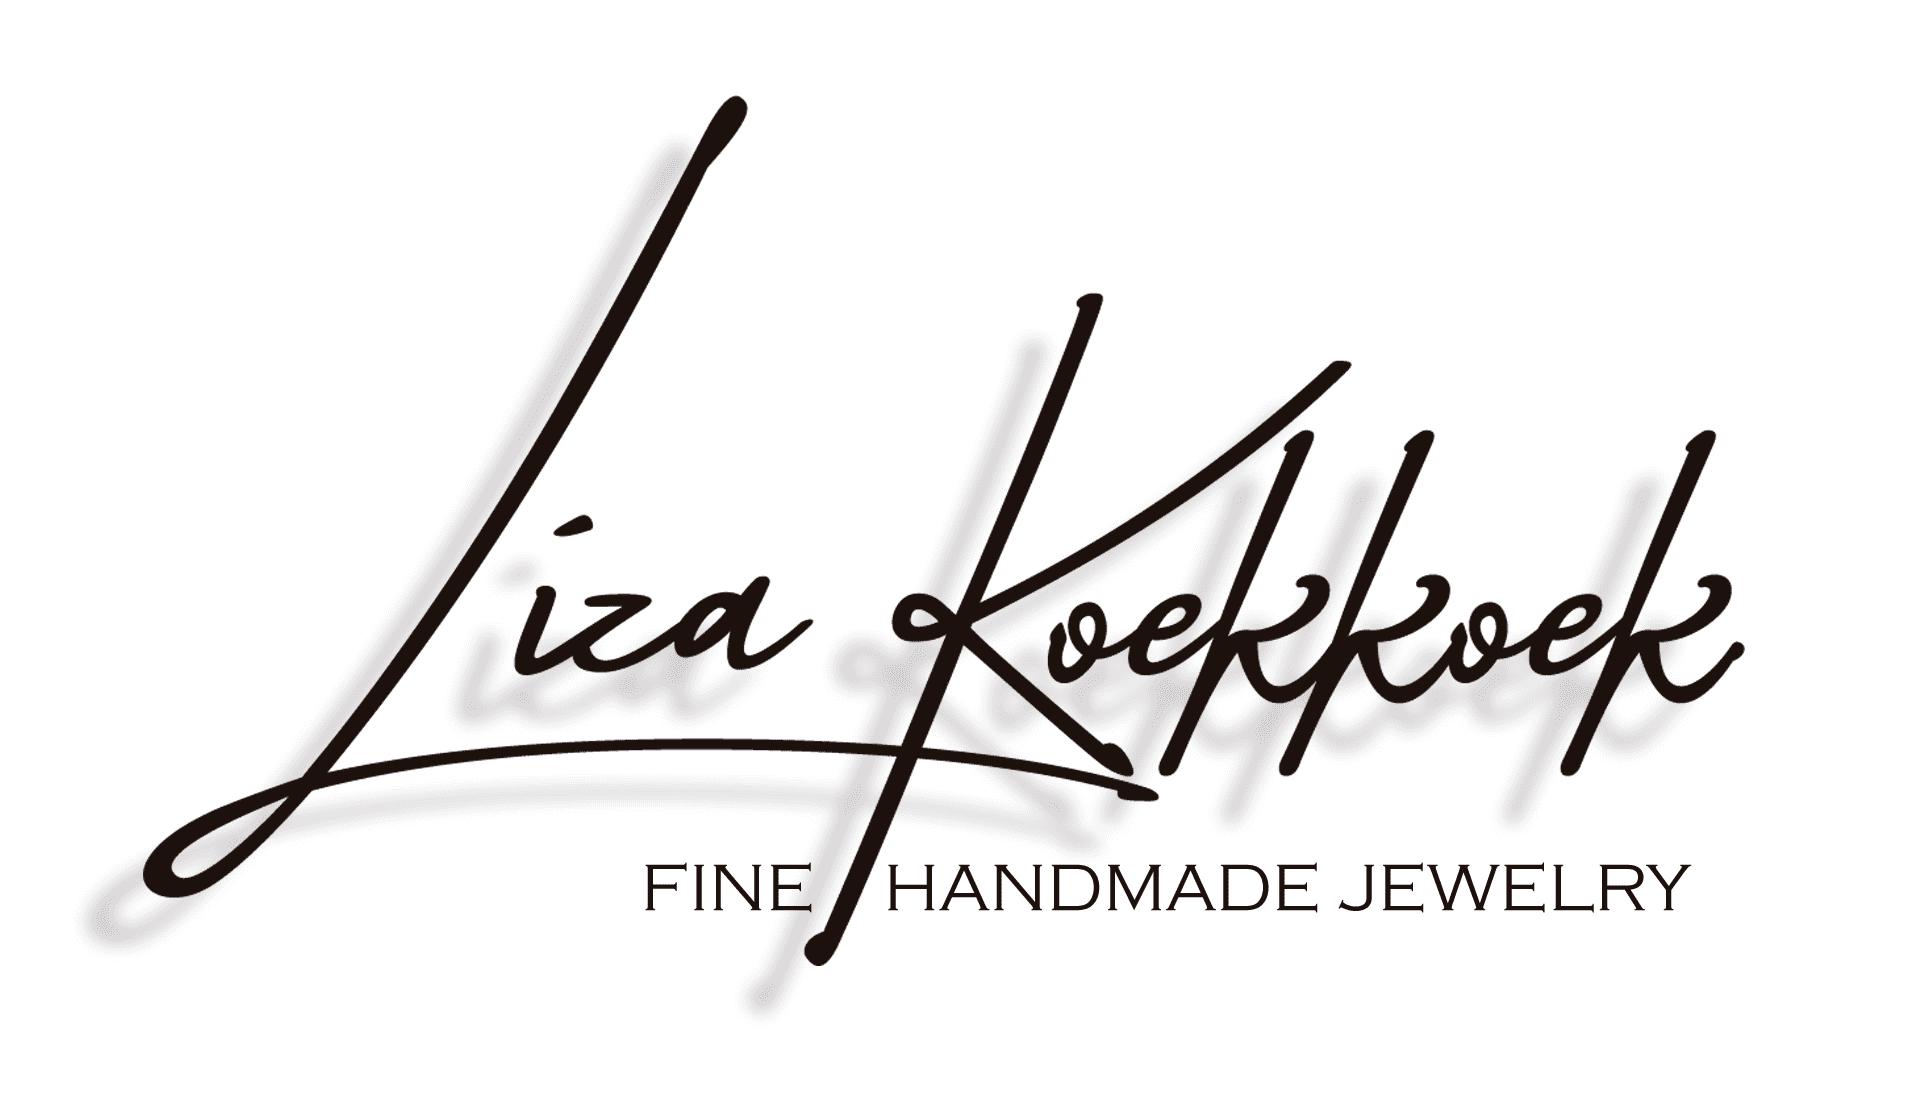 Liza Koekkoek – Joyería fina artesanal en linea